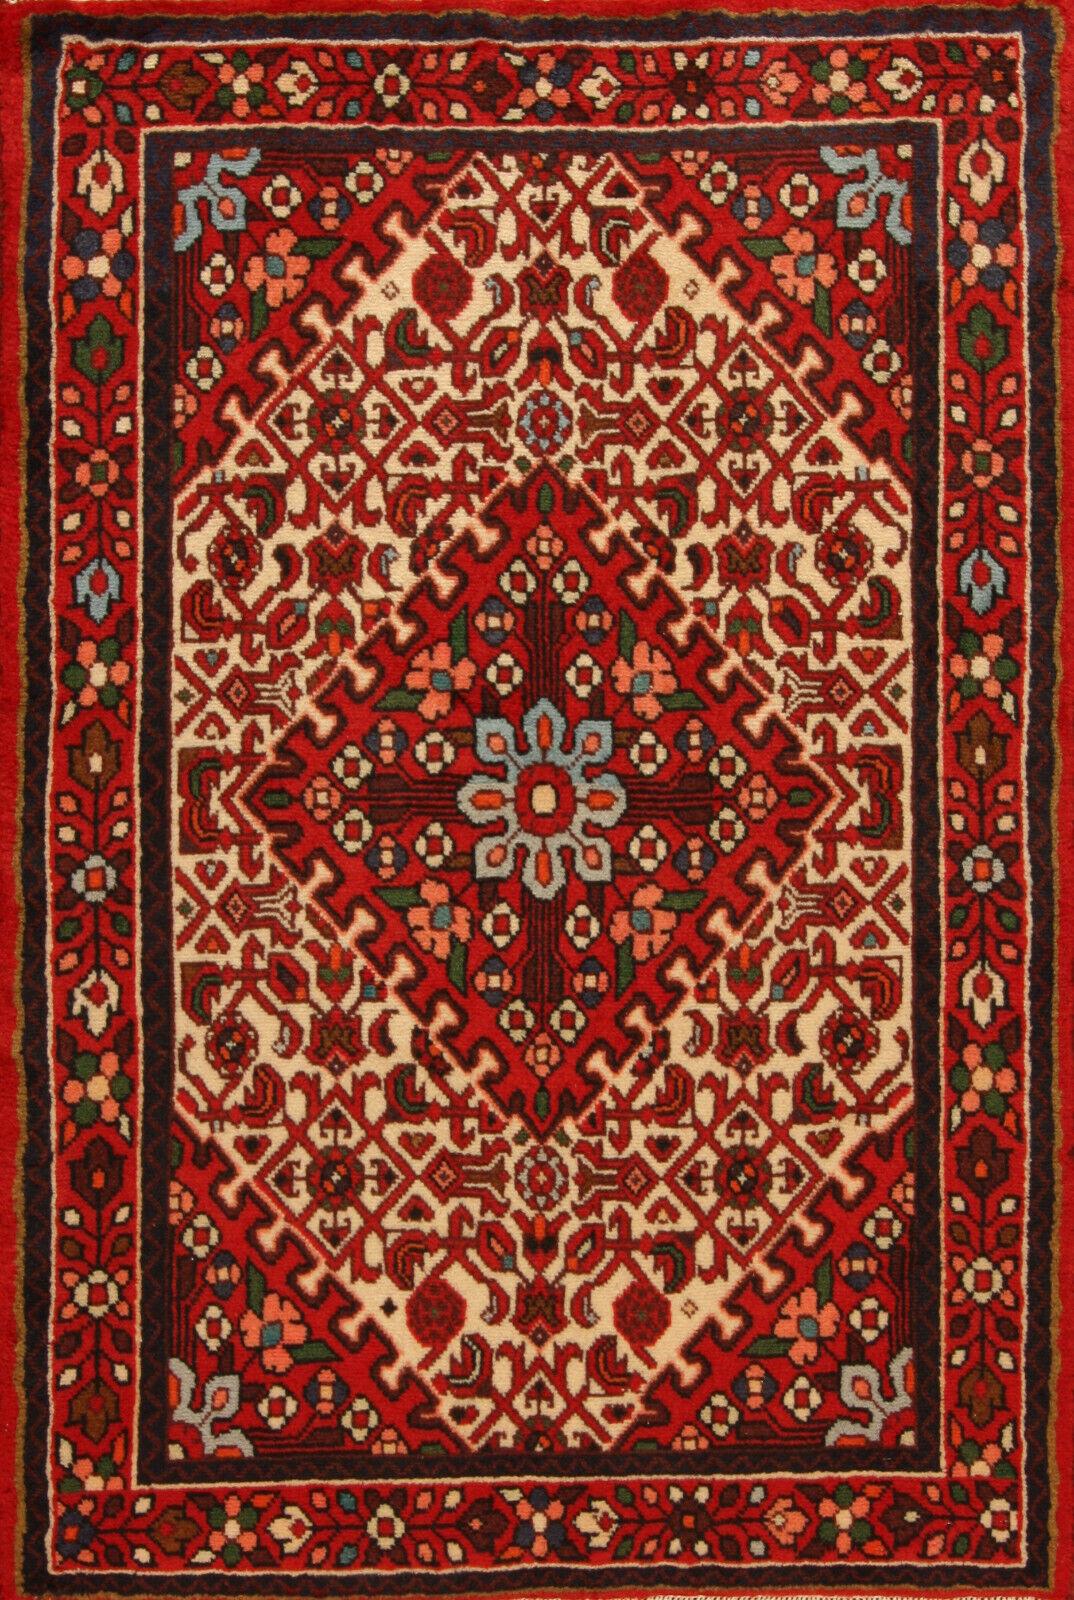 TAPPETO Orientale Vero Annodato Tapis persan n. 4610 (147 x 100) cm Nuovo